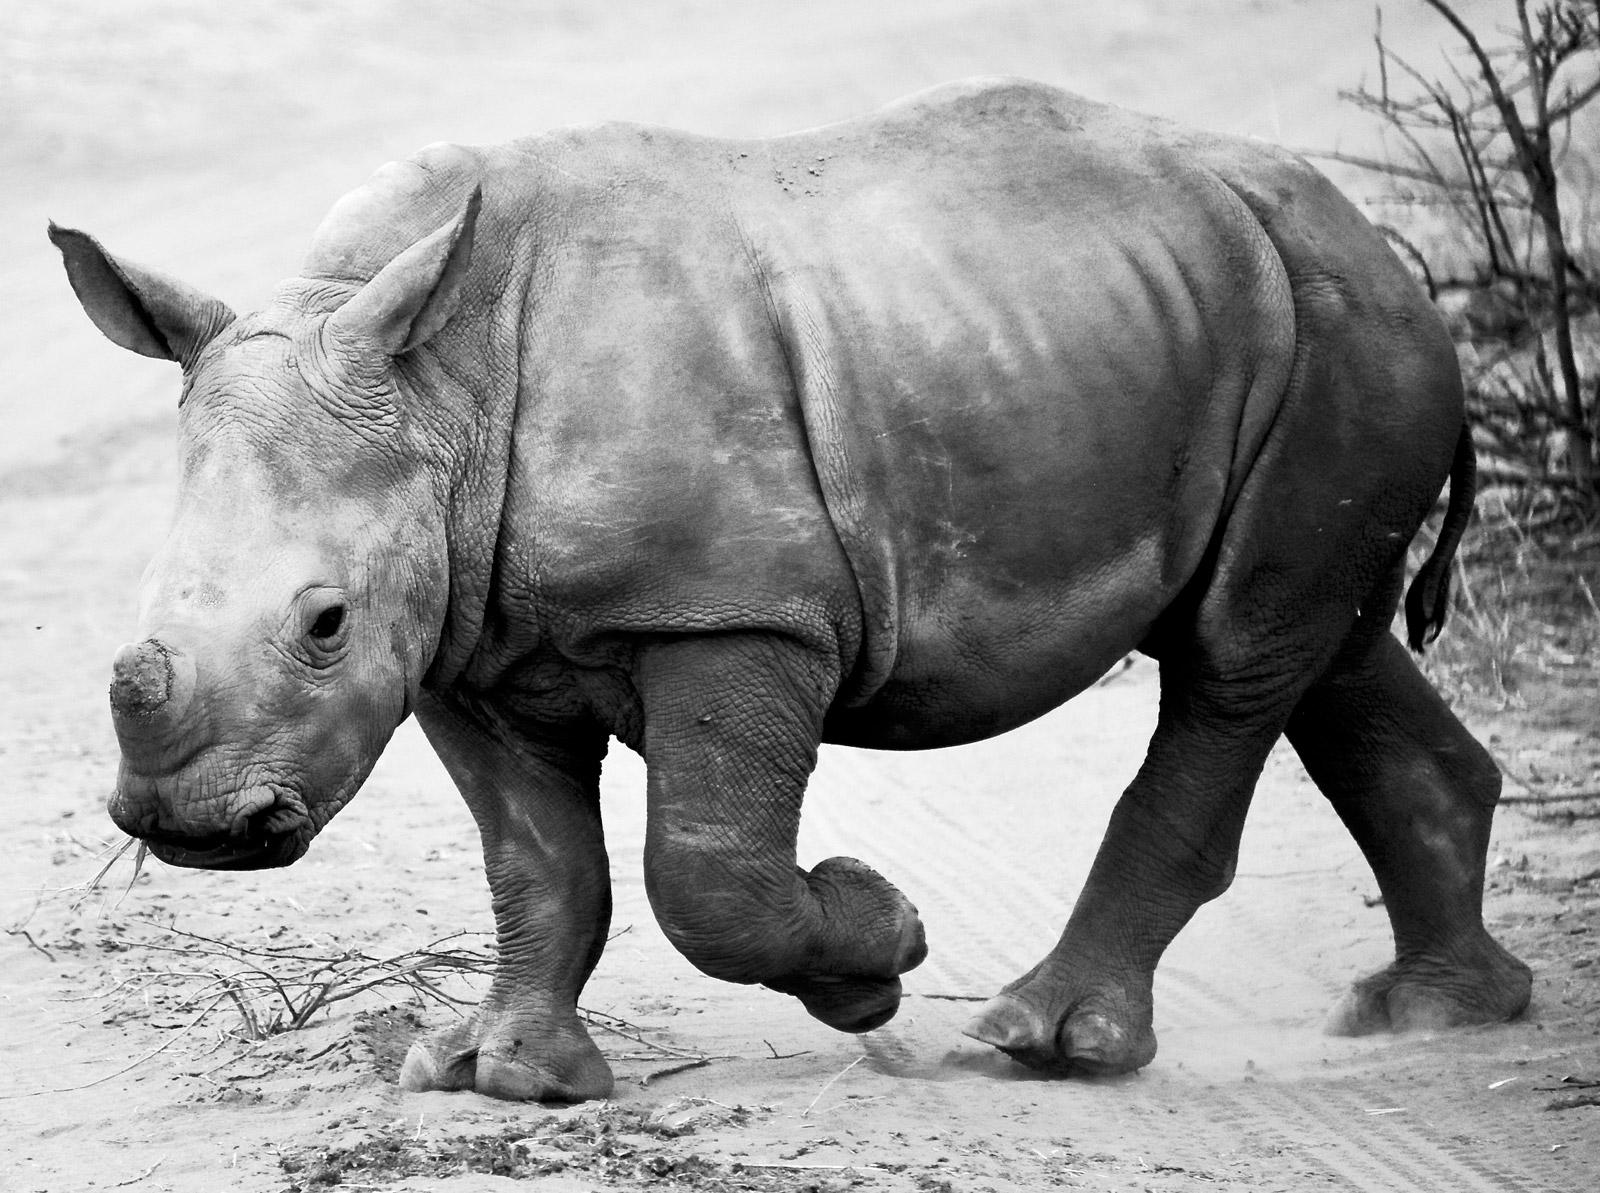 rhino trade debate south africa